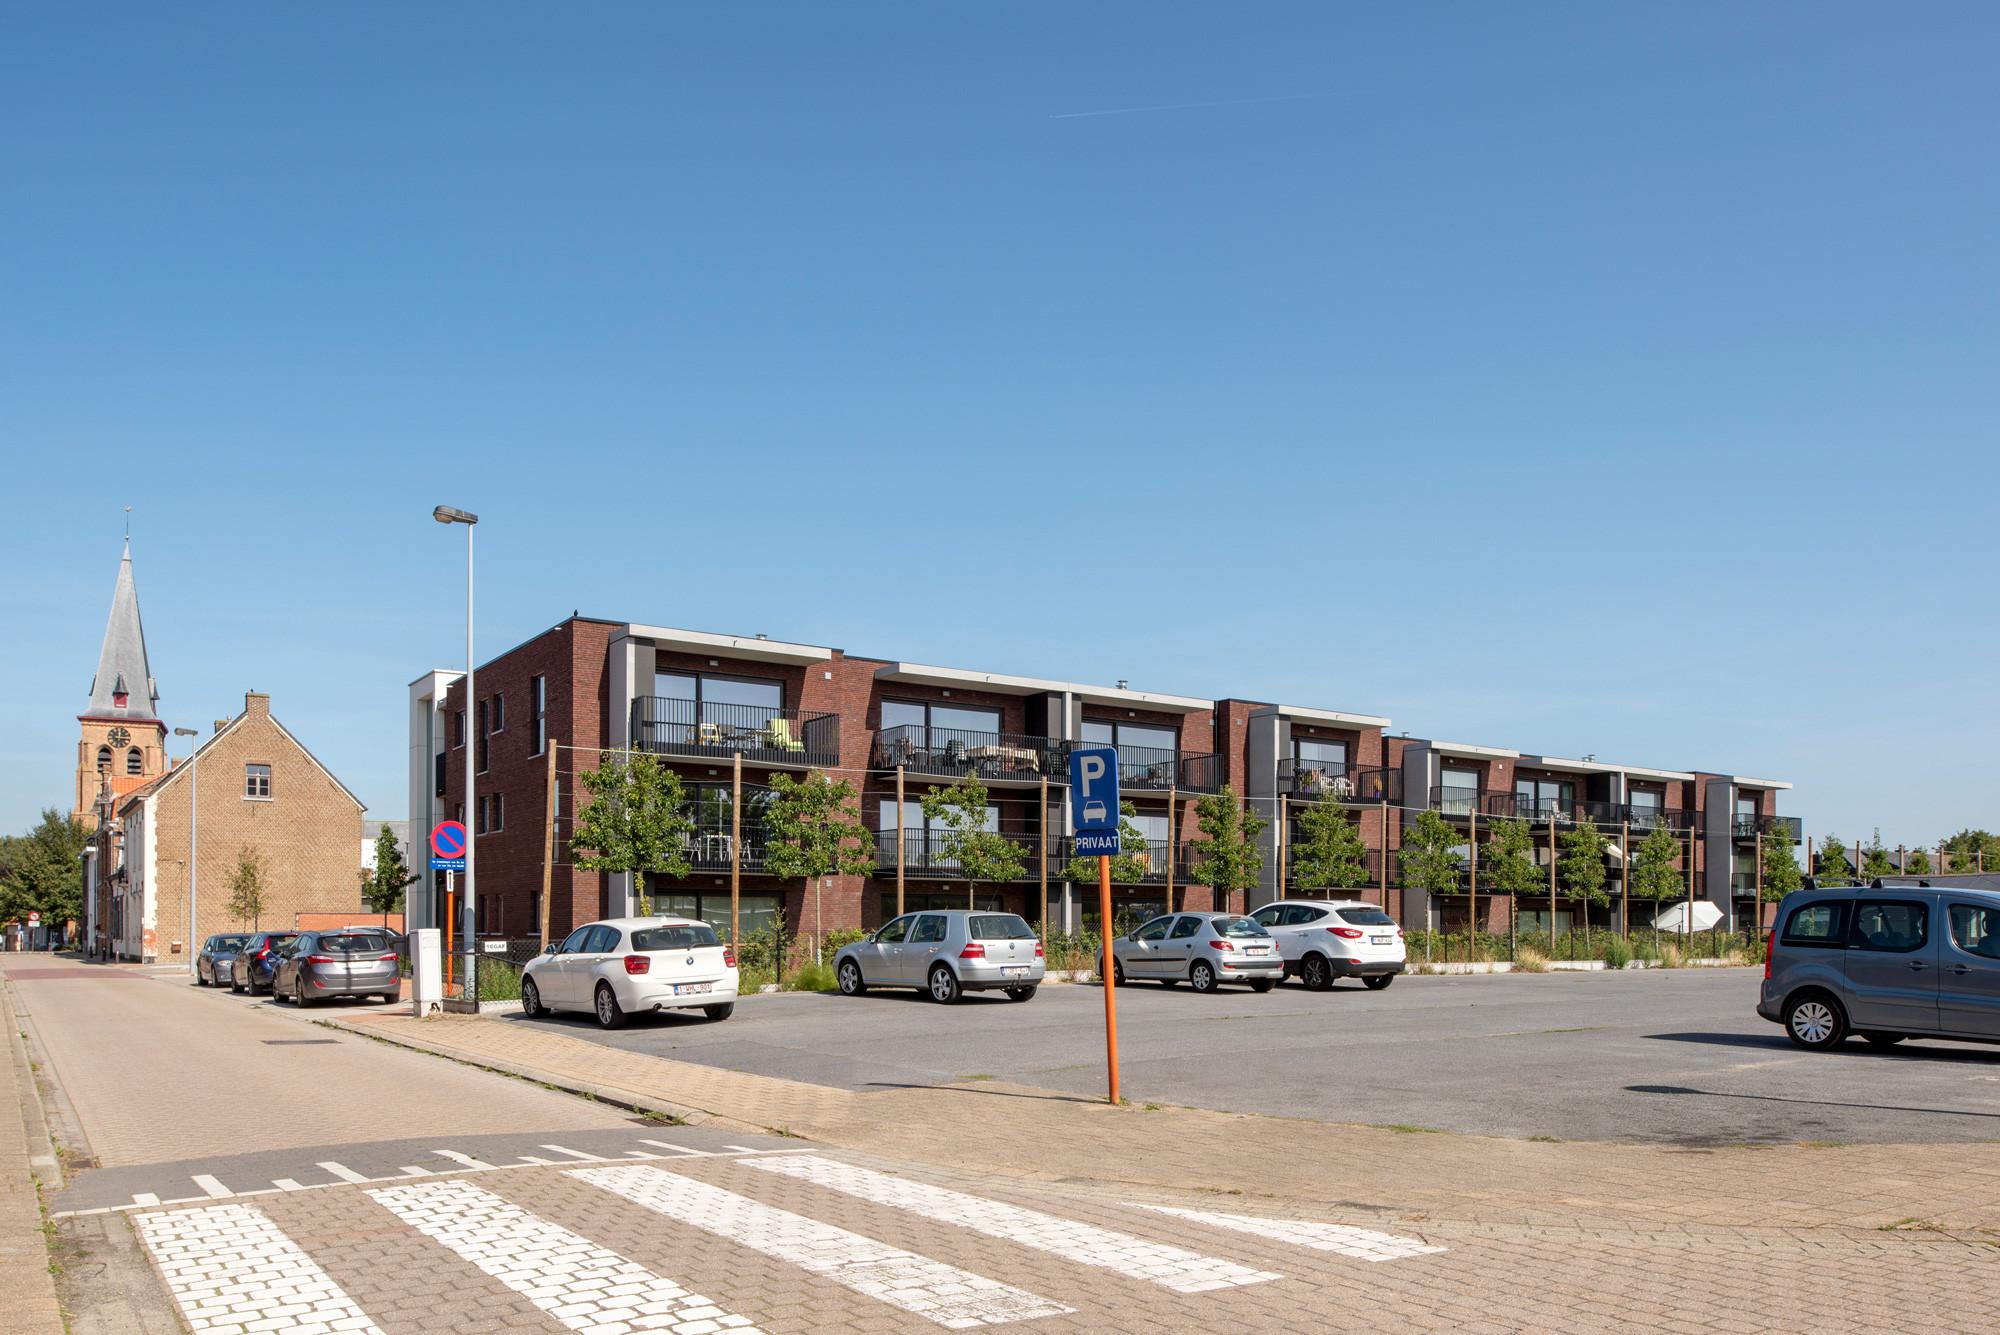 Meergezinswoning_Beernem_Claeys Architecten